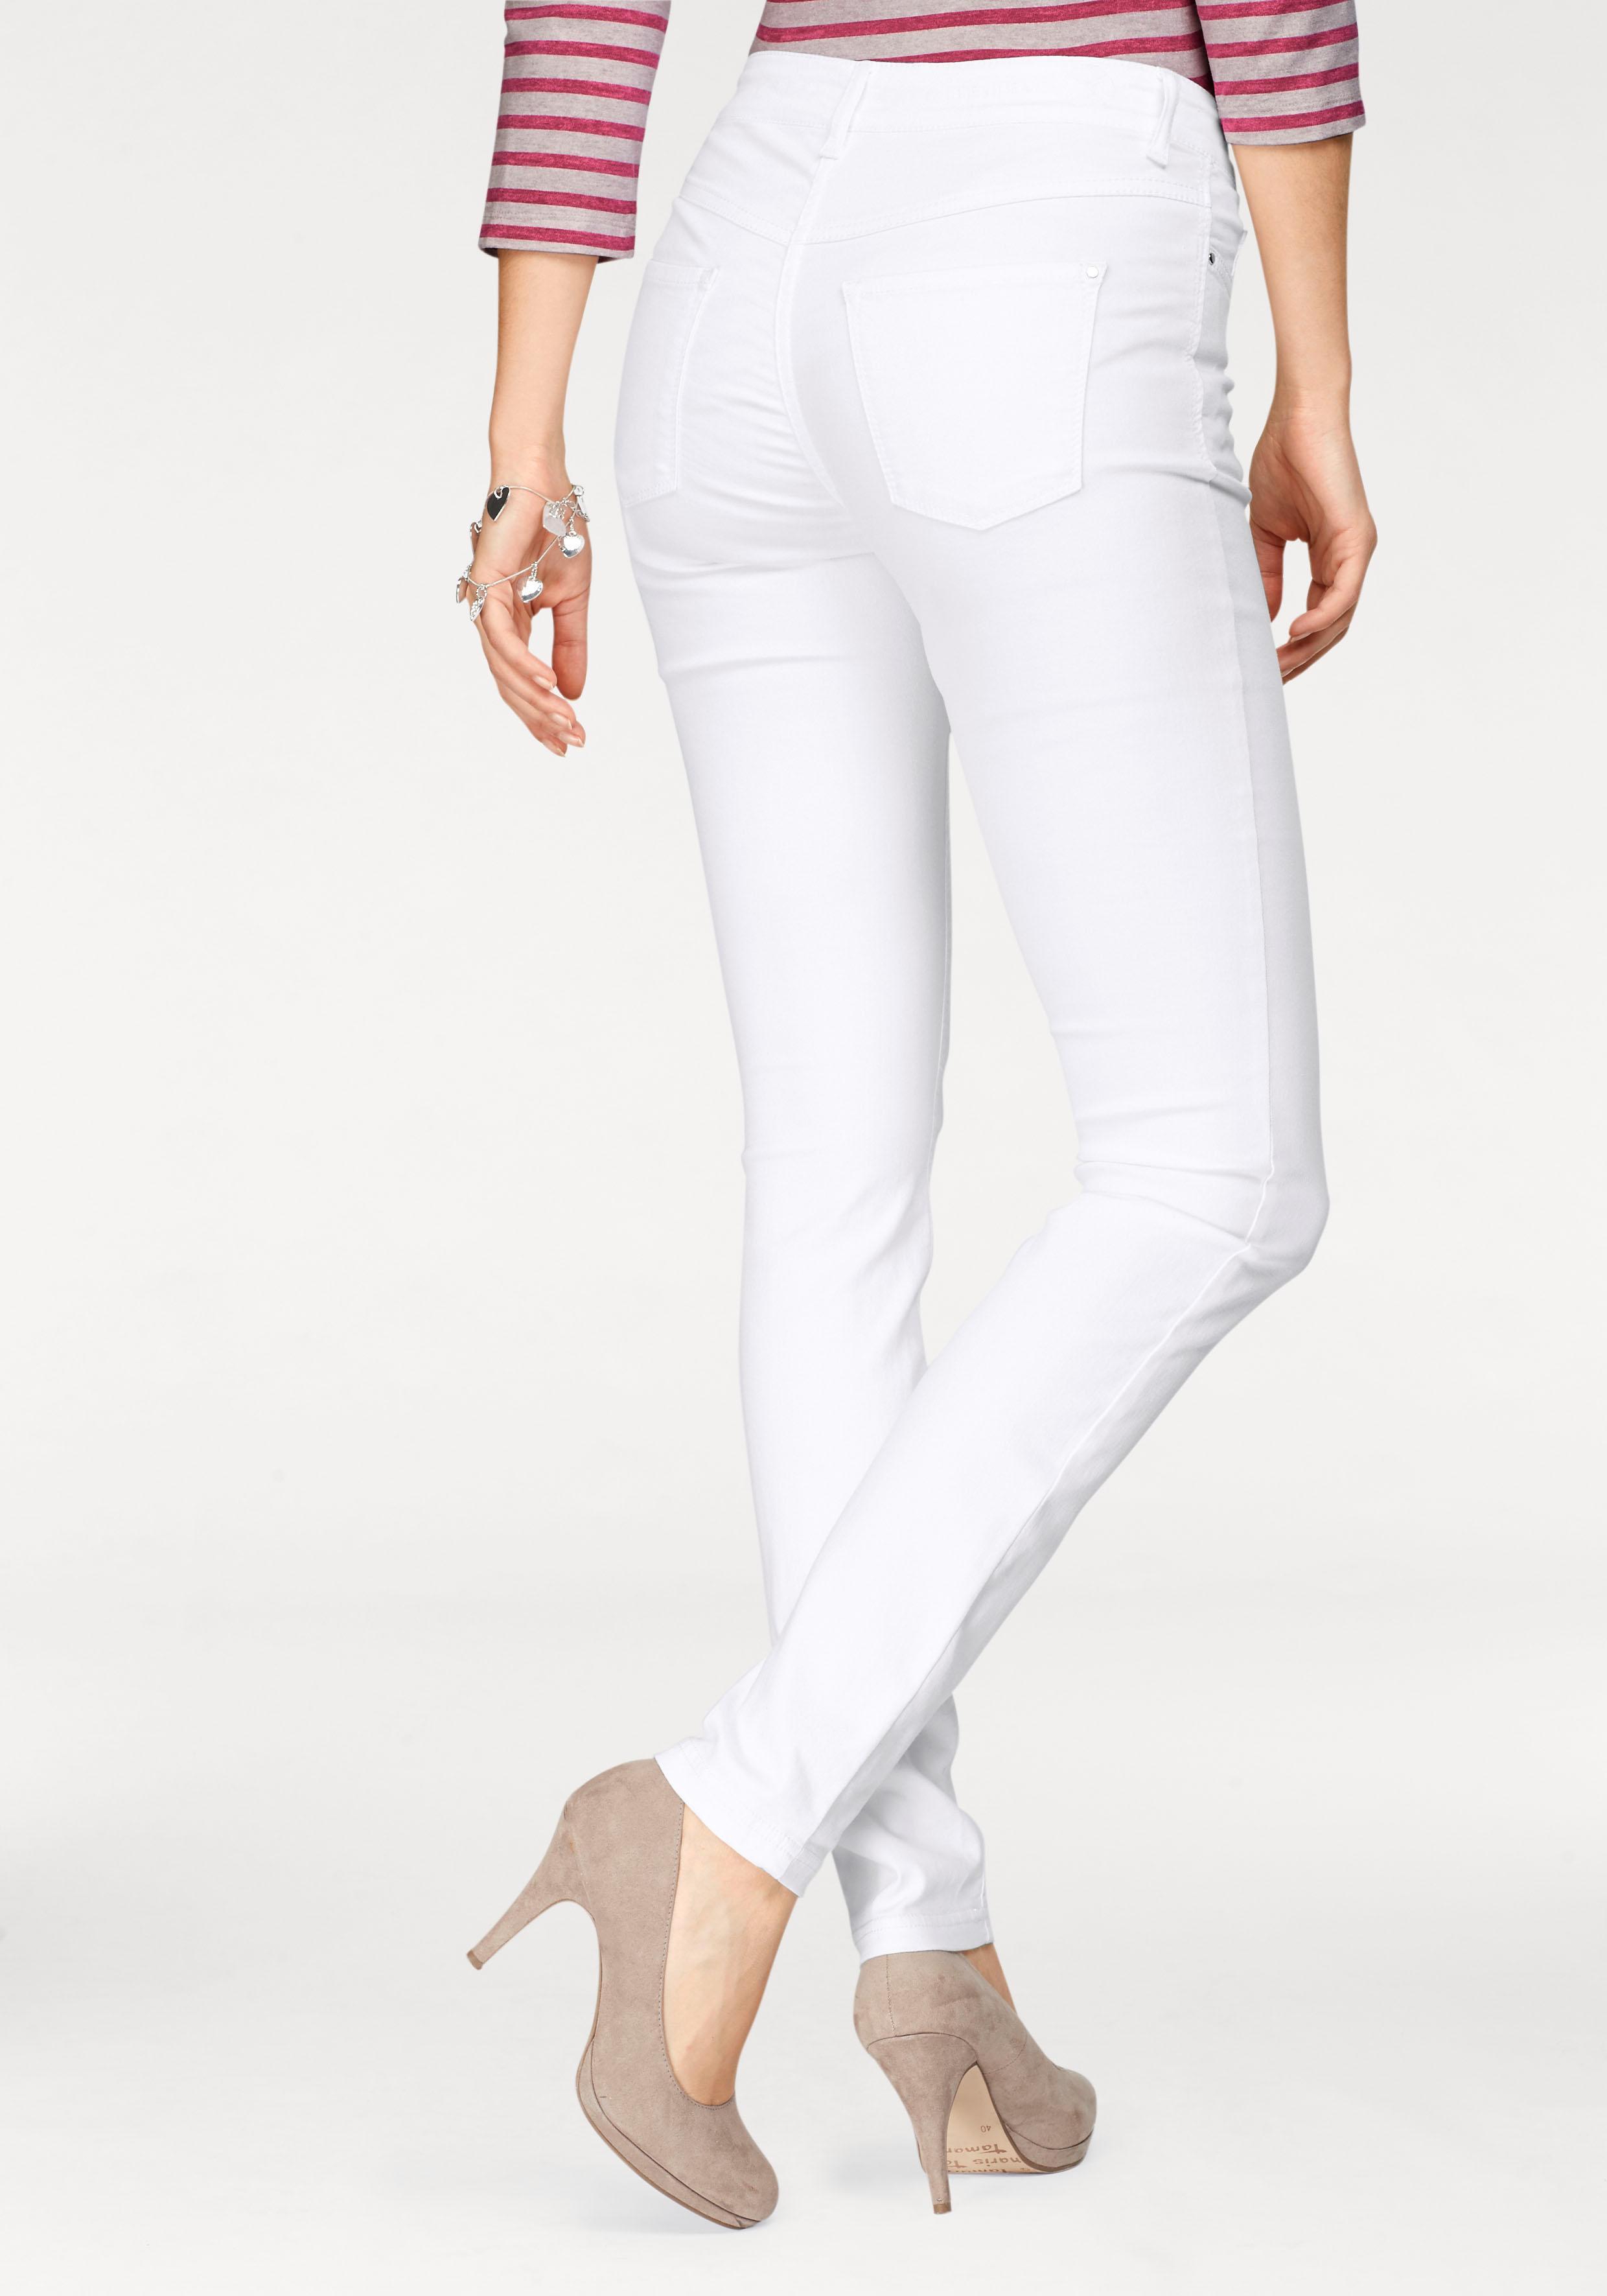 MAC Gerade Jeans Dream Skinny | Bekleidung > Jeans > Gerade Jeans | Weiß | Mac